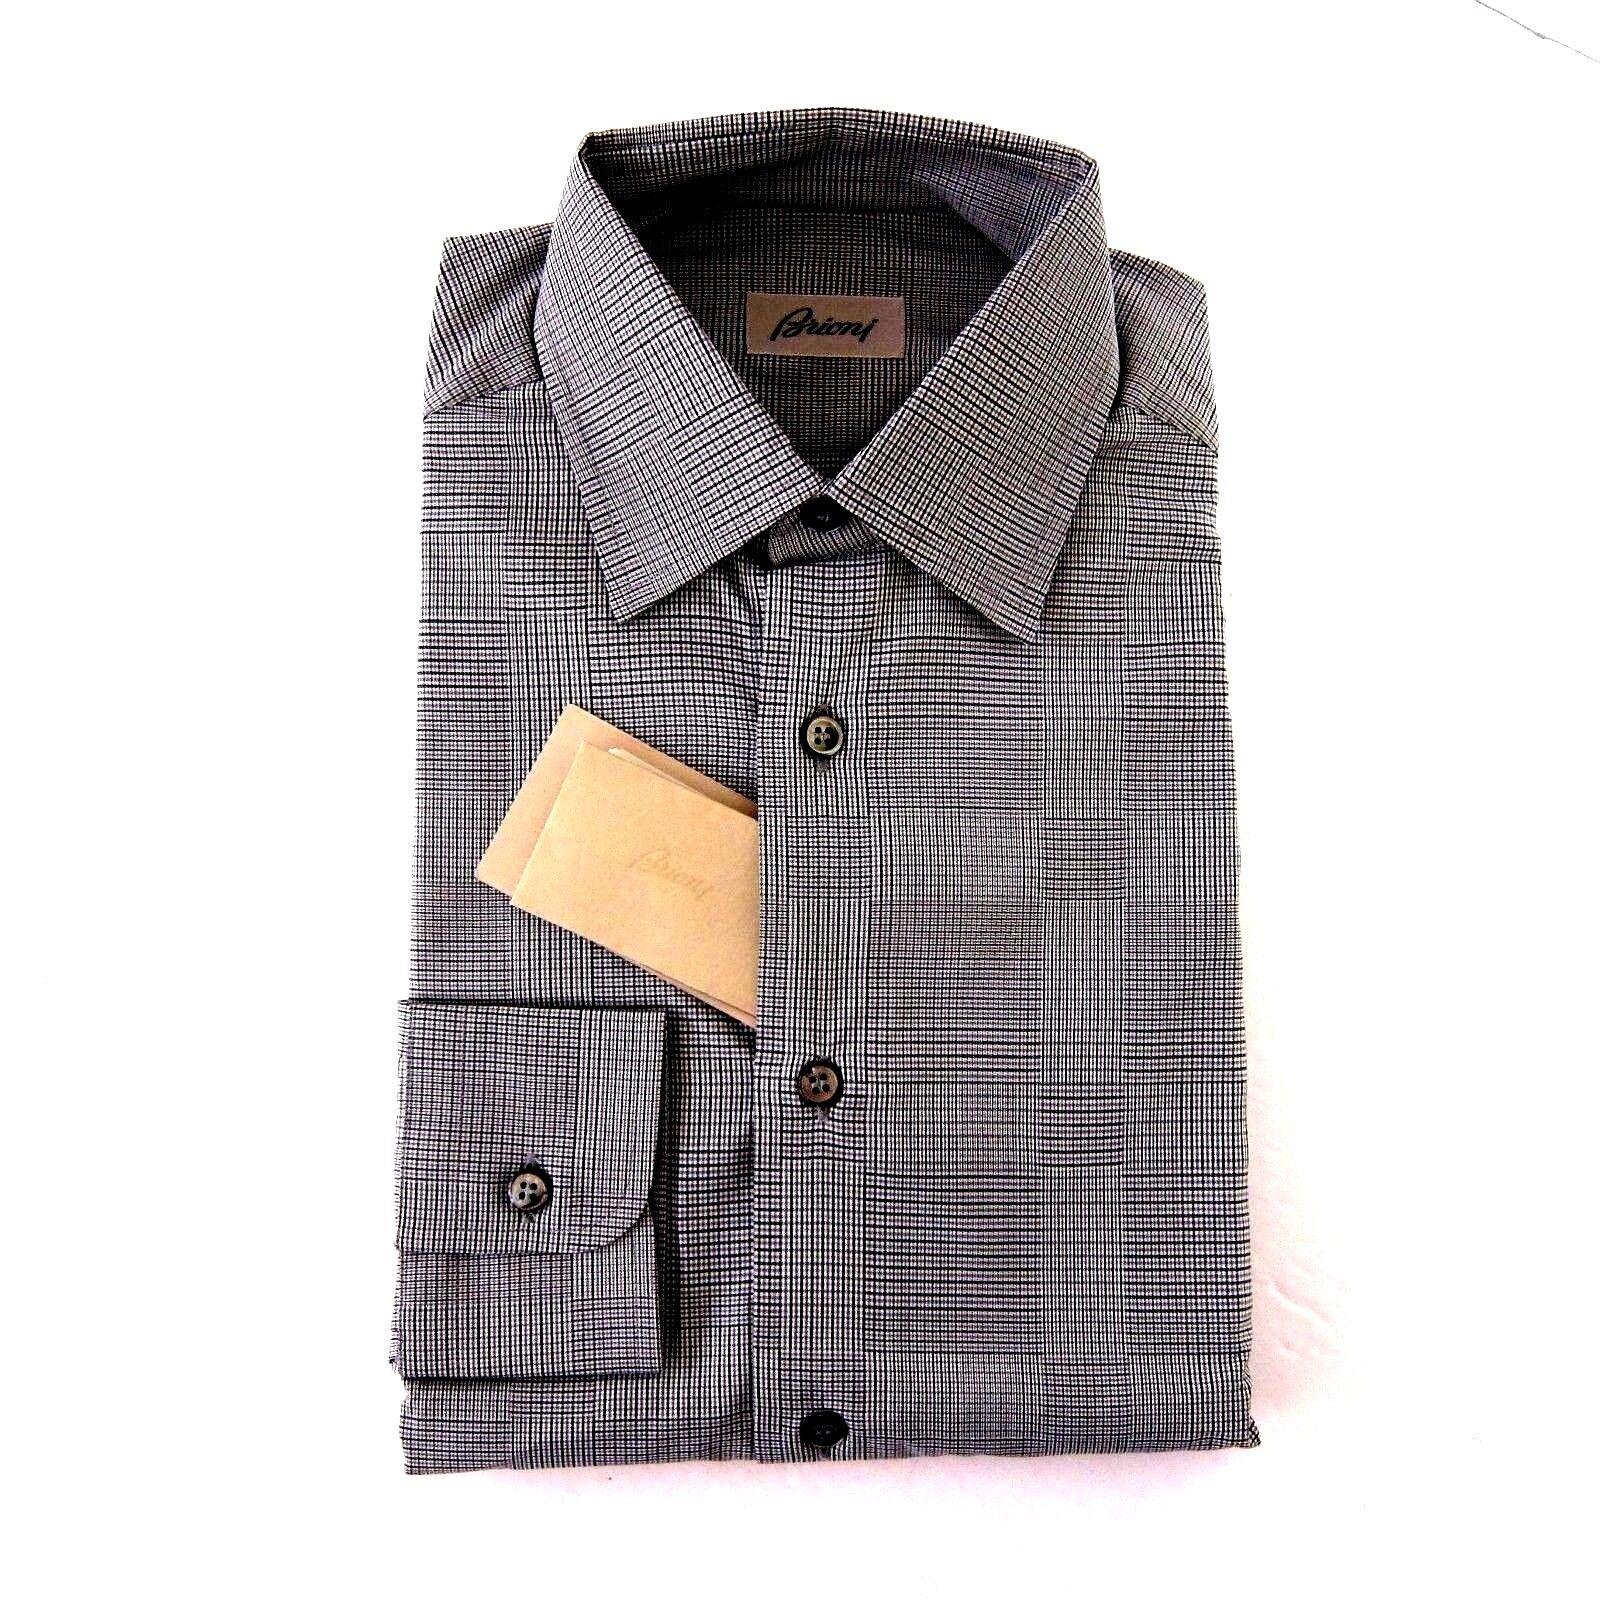 J-3421955 Neu Brioni Marineblau Führung Grau Oxford Knopf Hemd Größe XL  | Hochwertige Produkte